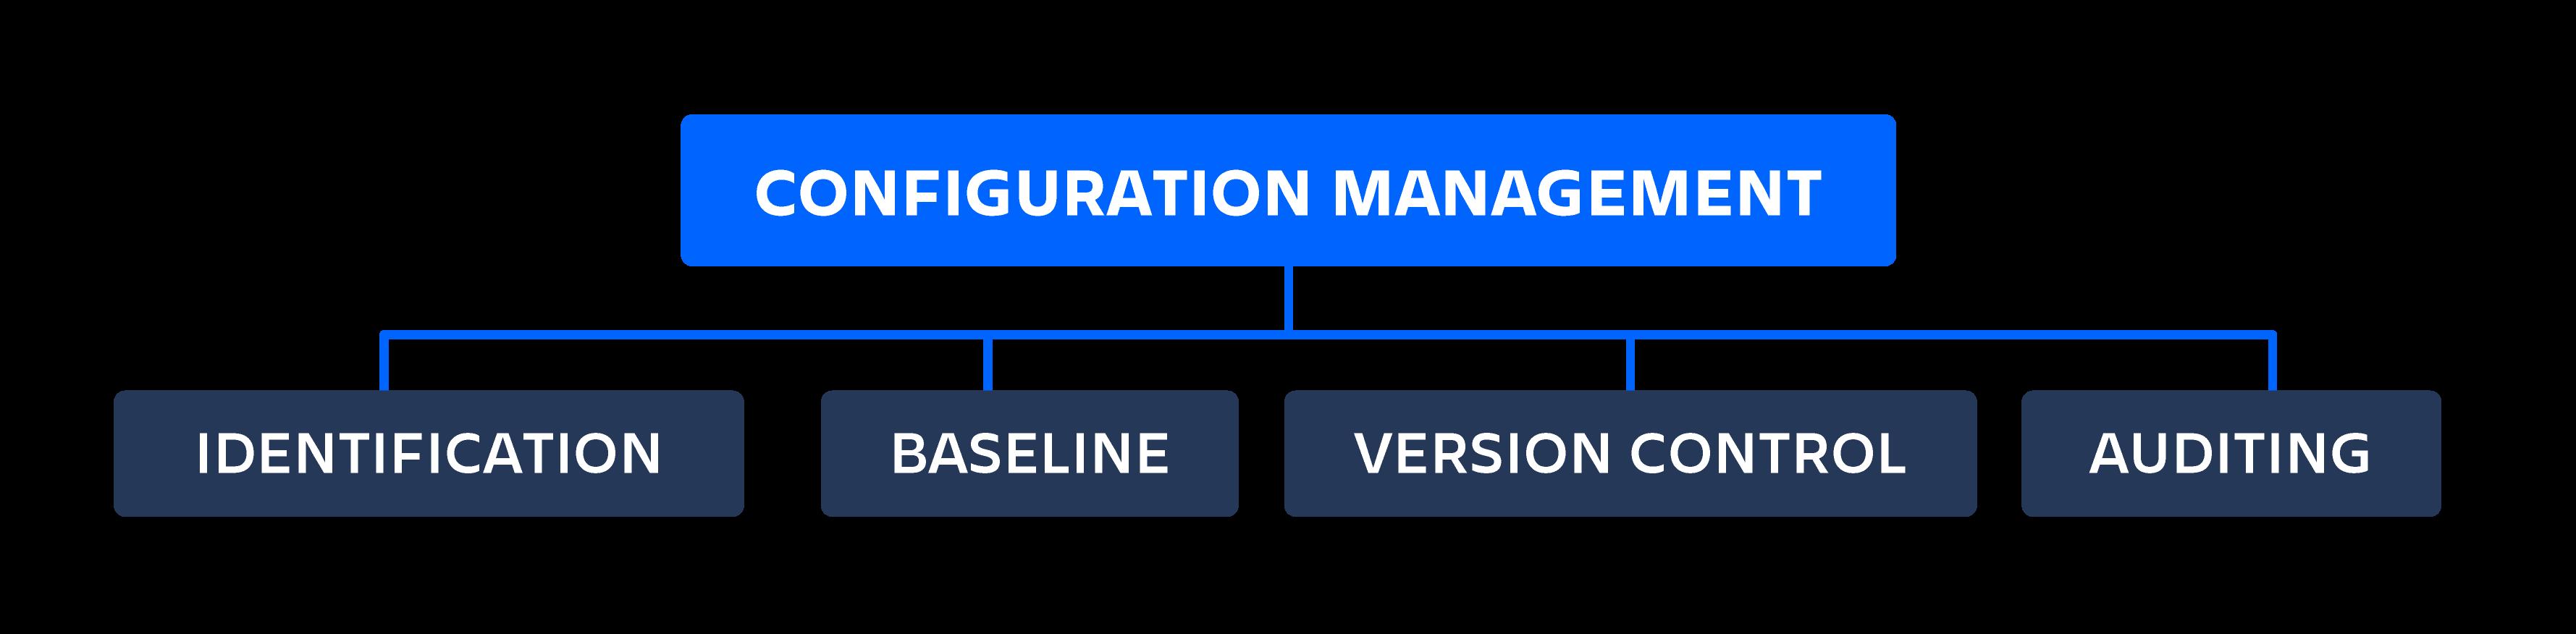 Configuration management diagram